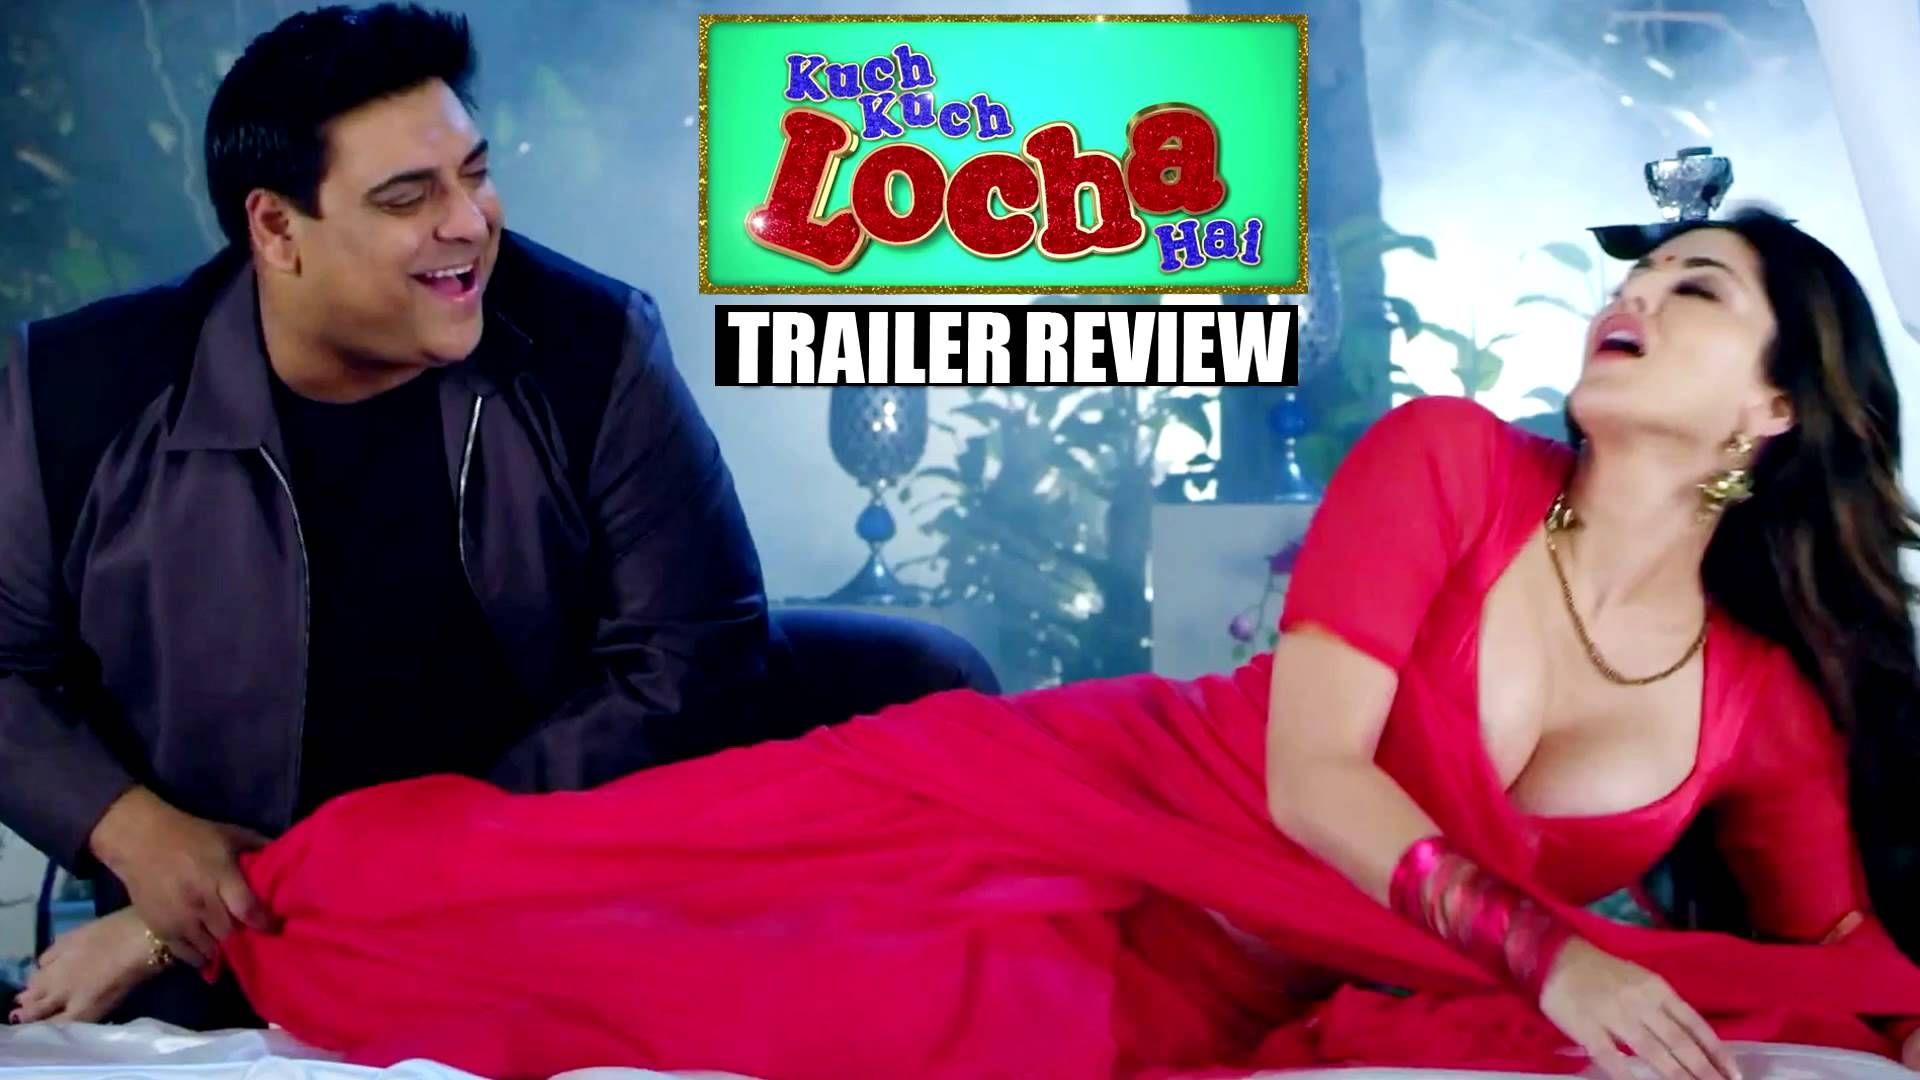 Kuch kuch locha hai trailer sunny leone ram kapoor releases 30th march 2015